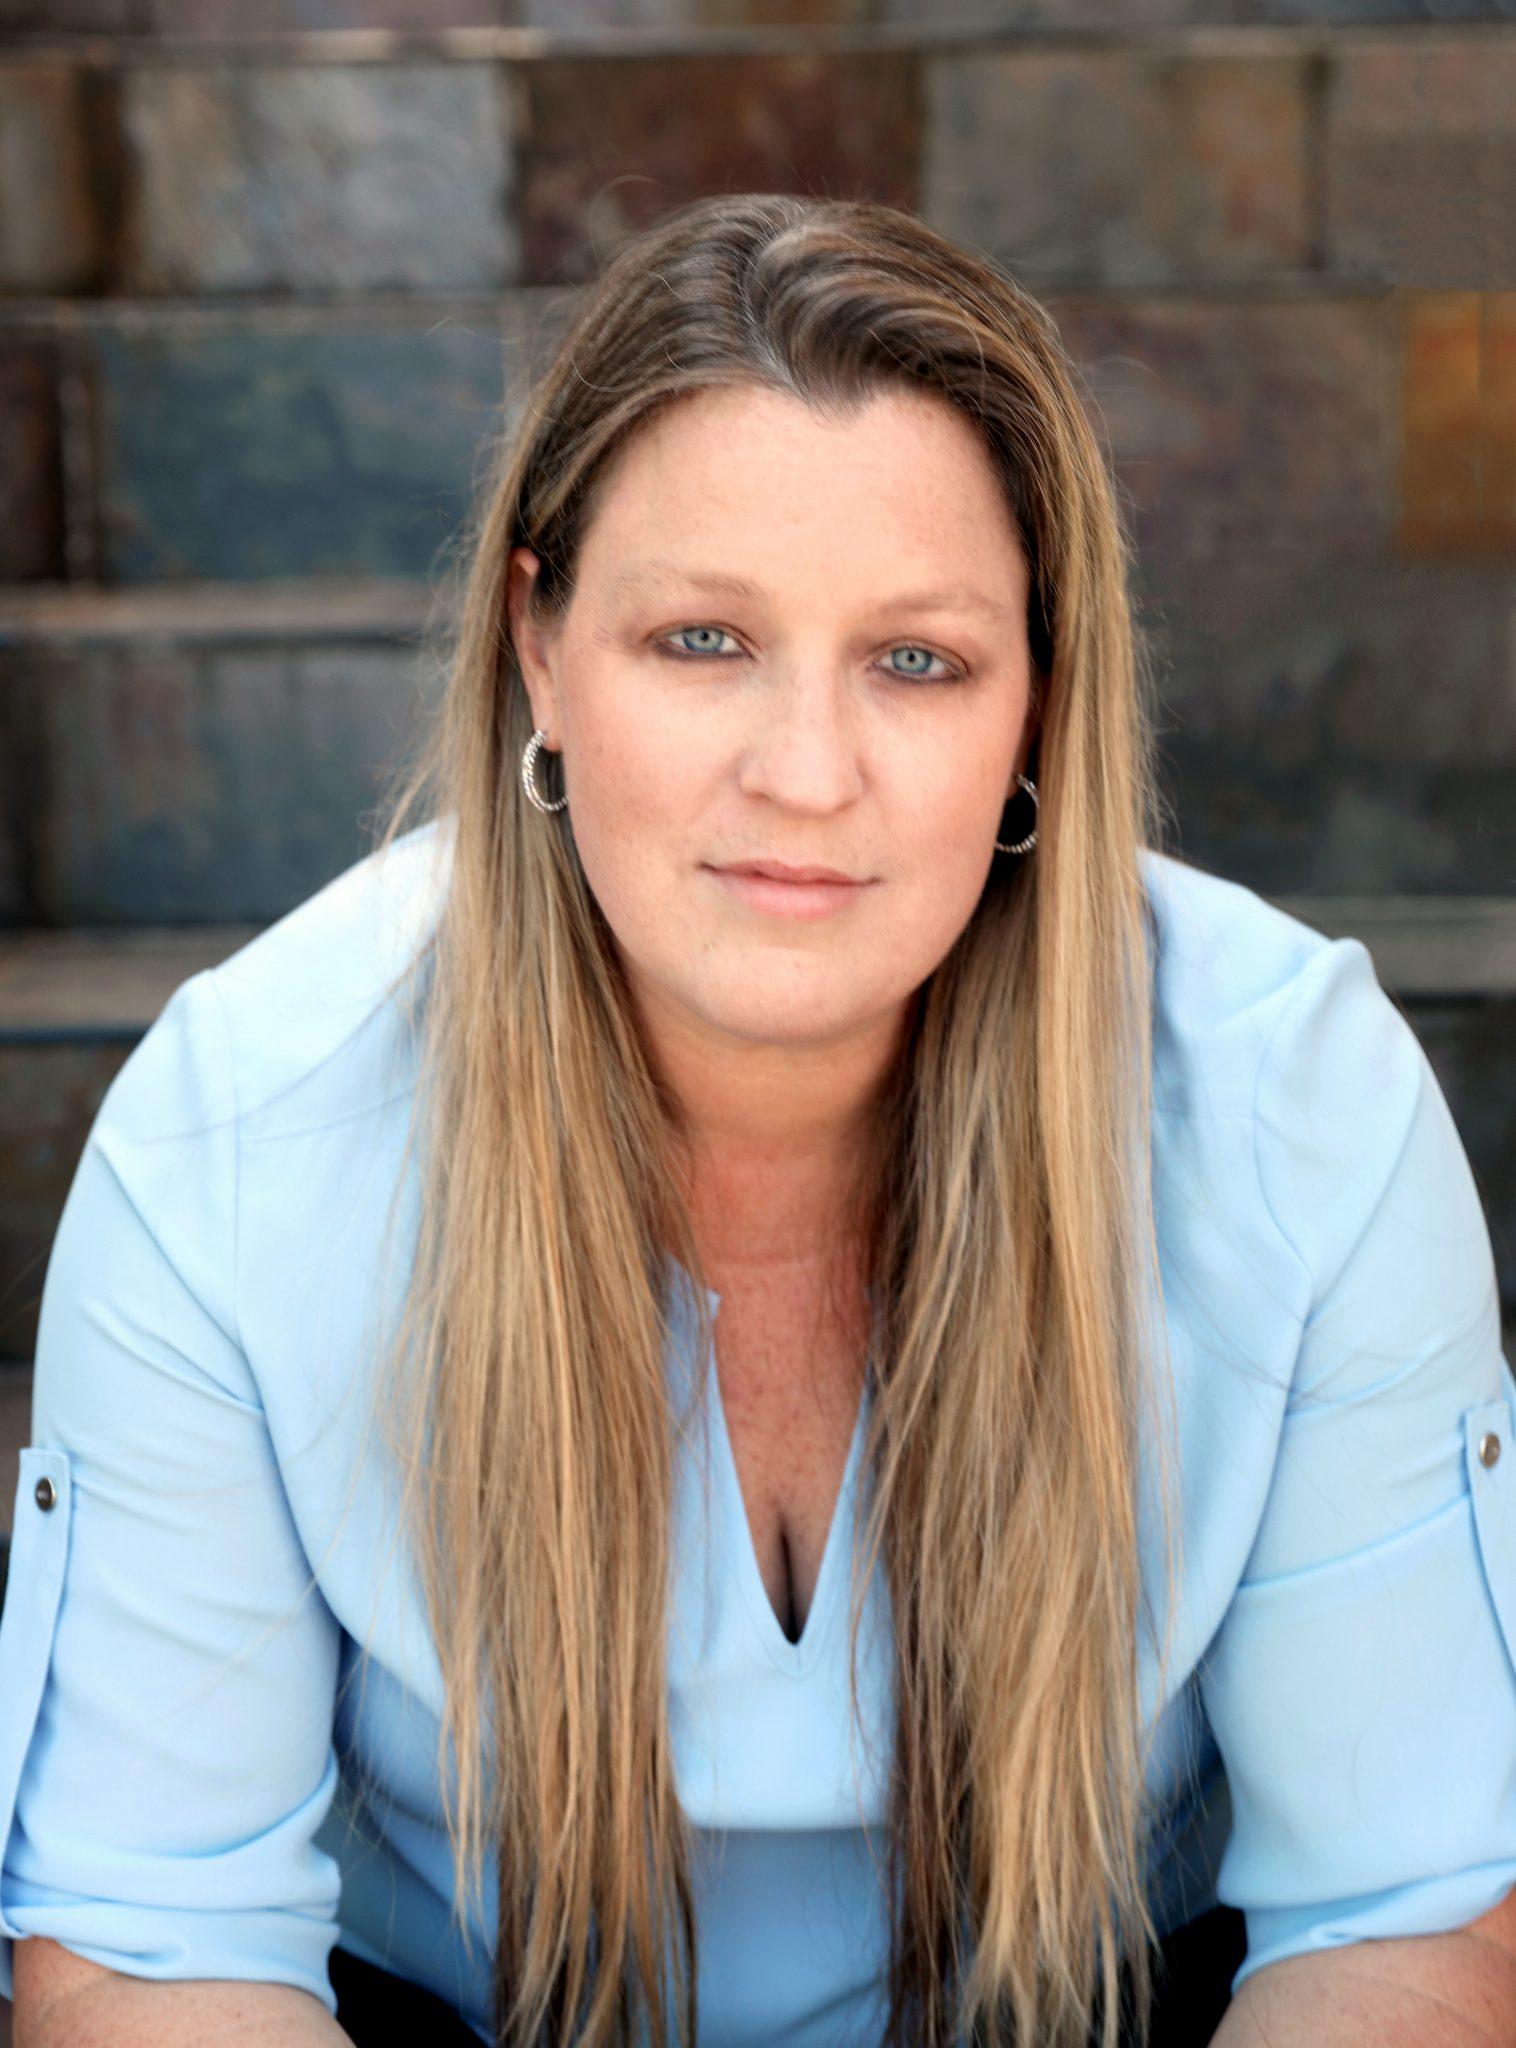 Stephanie Olsen